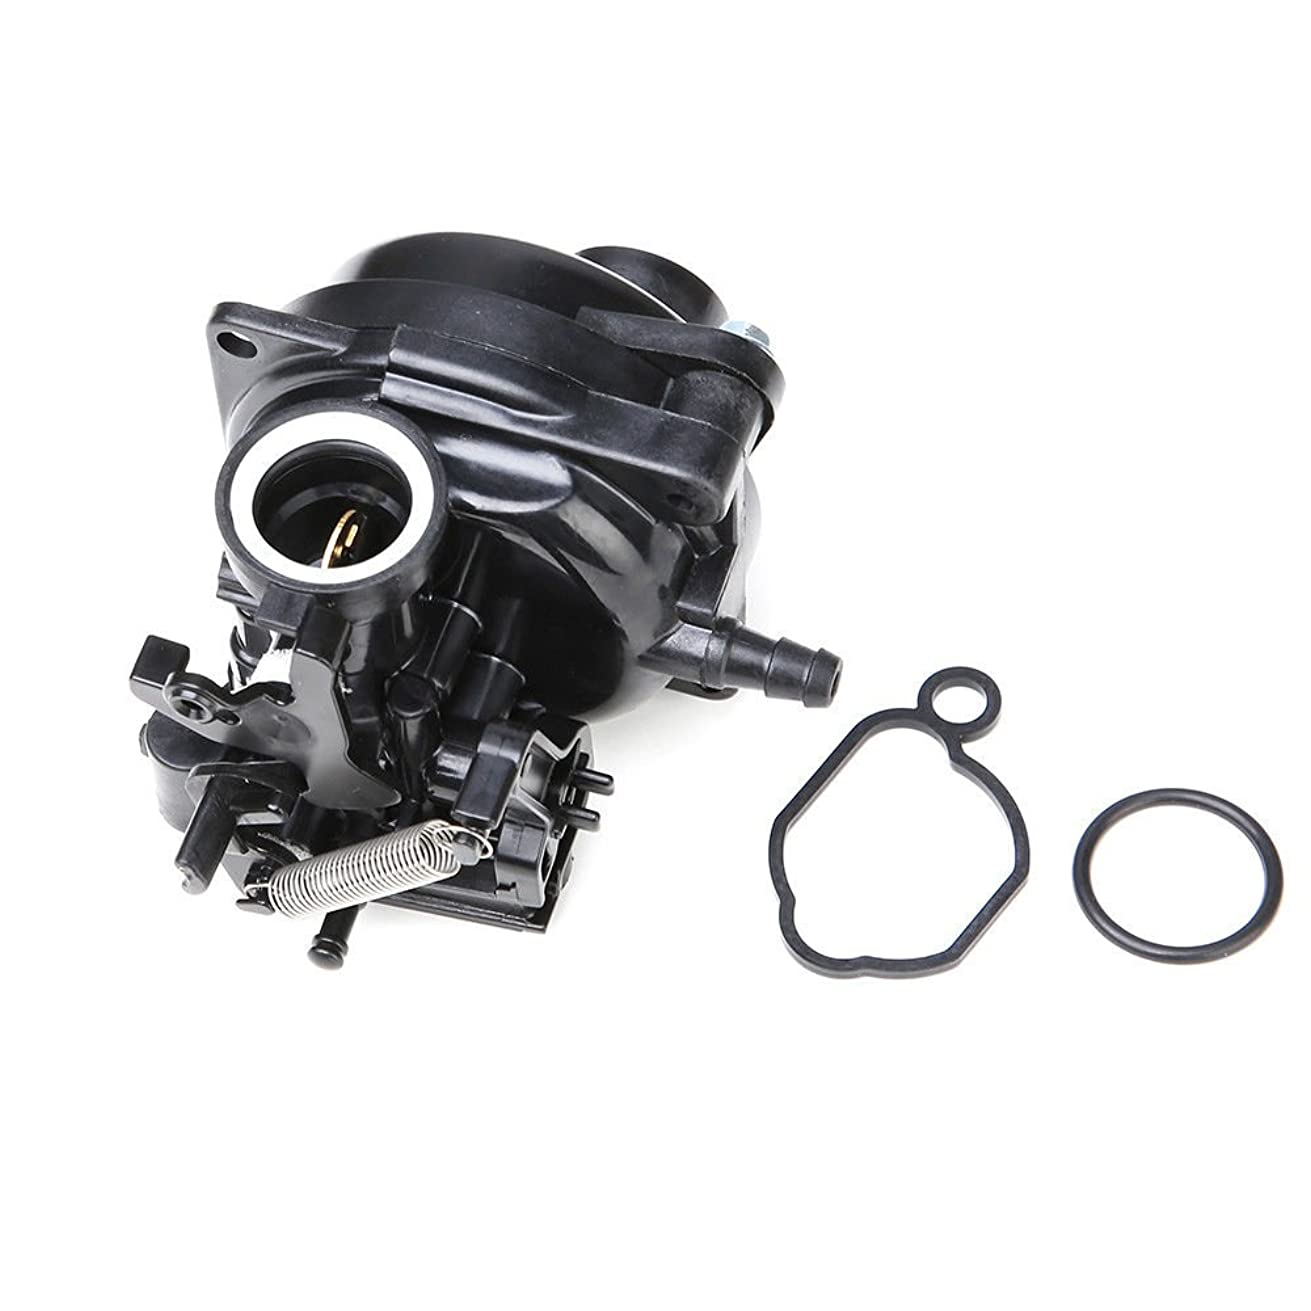 592361 Carburetor for Briggs and Stratton